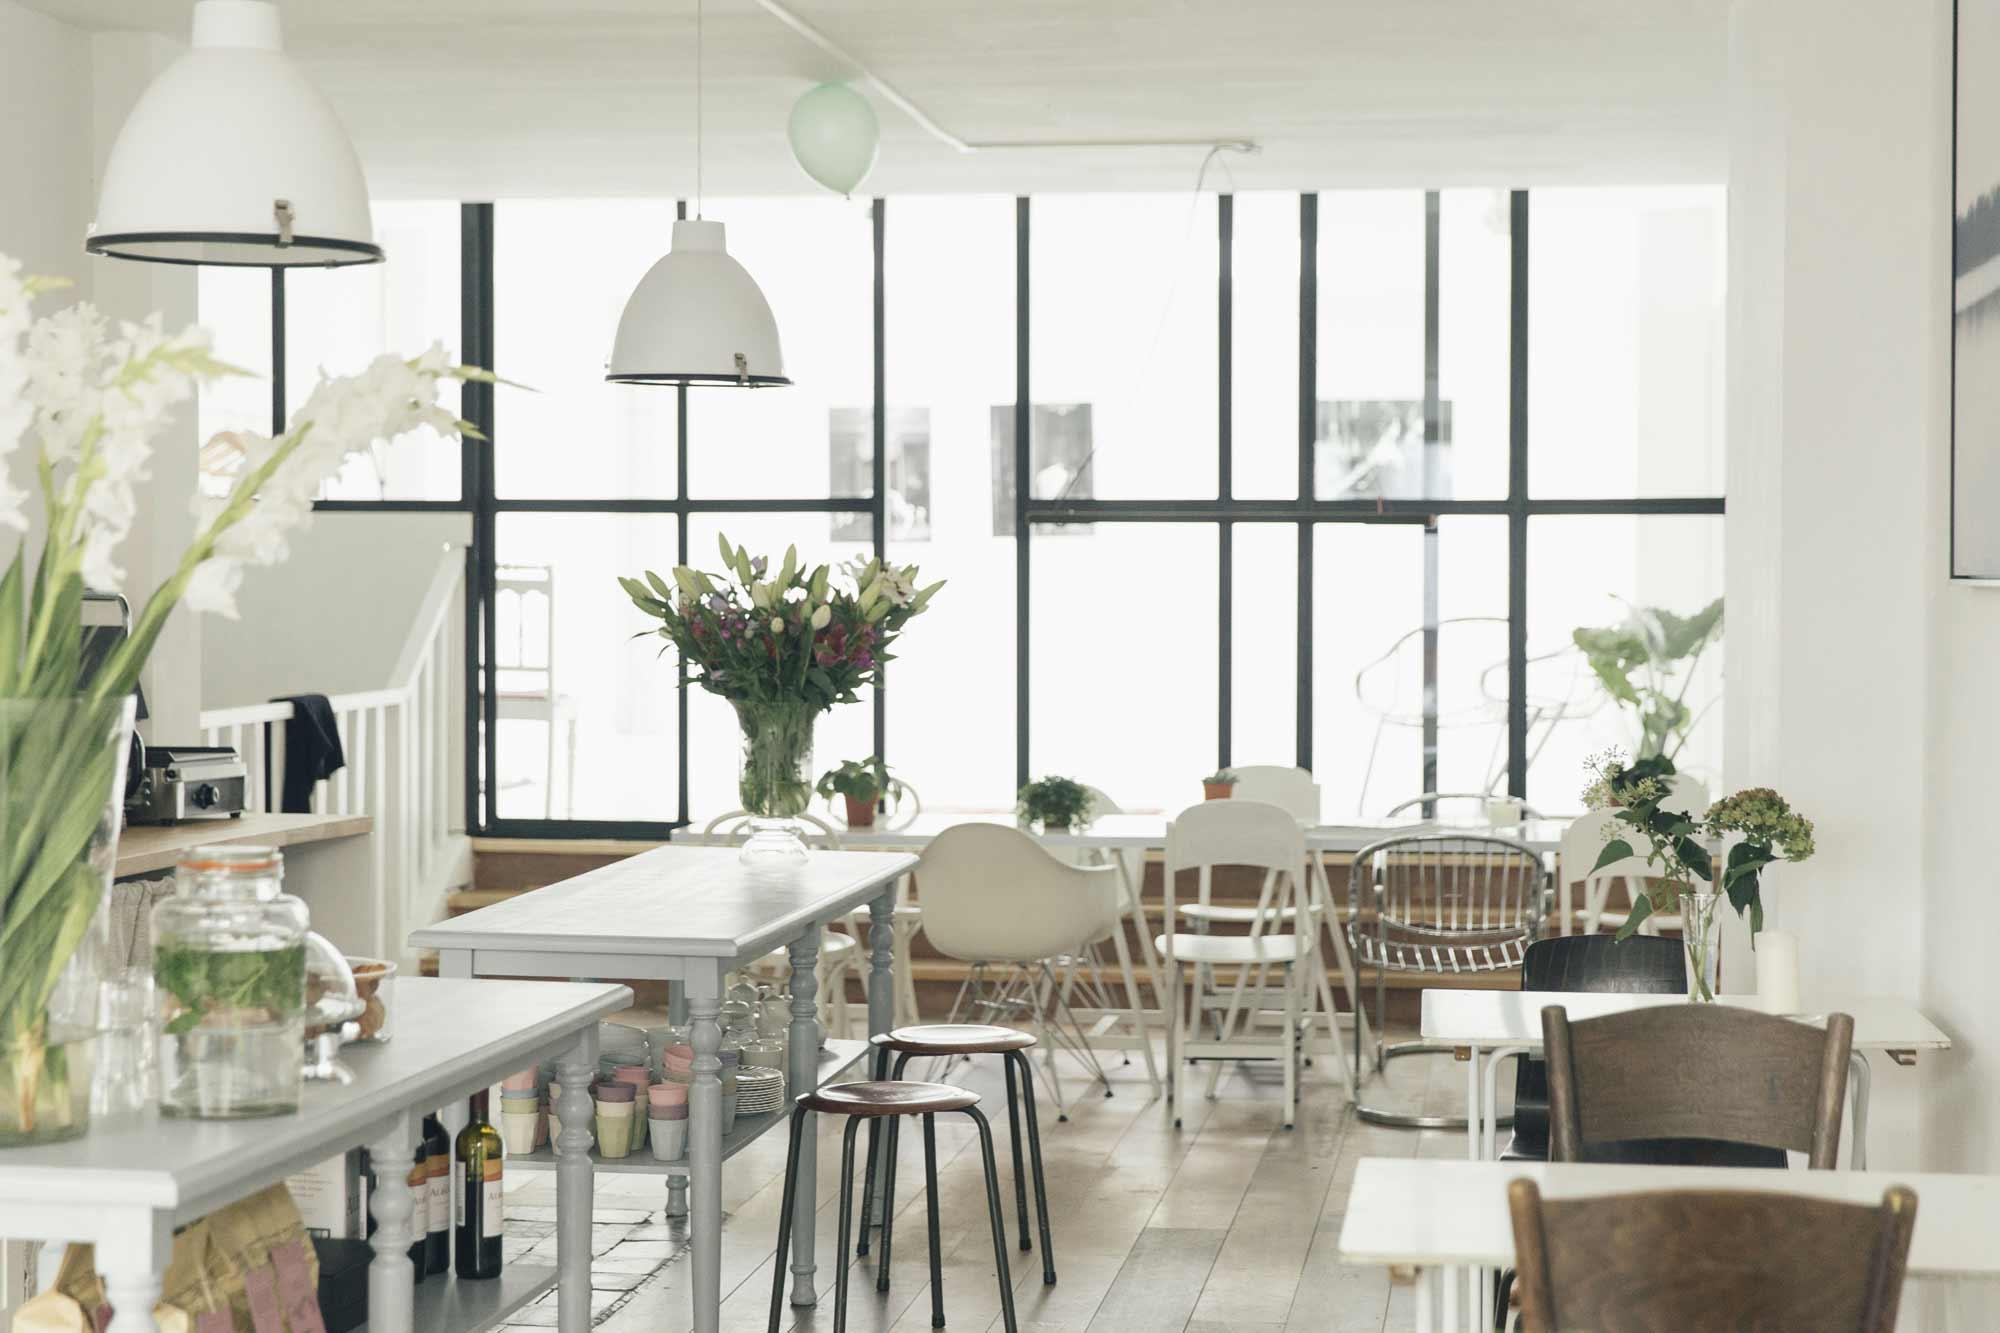 creatieve hotspot Amsterdam CreativeHaus